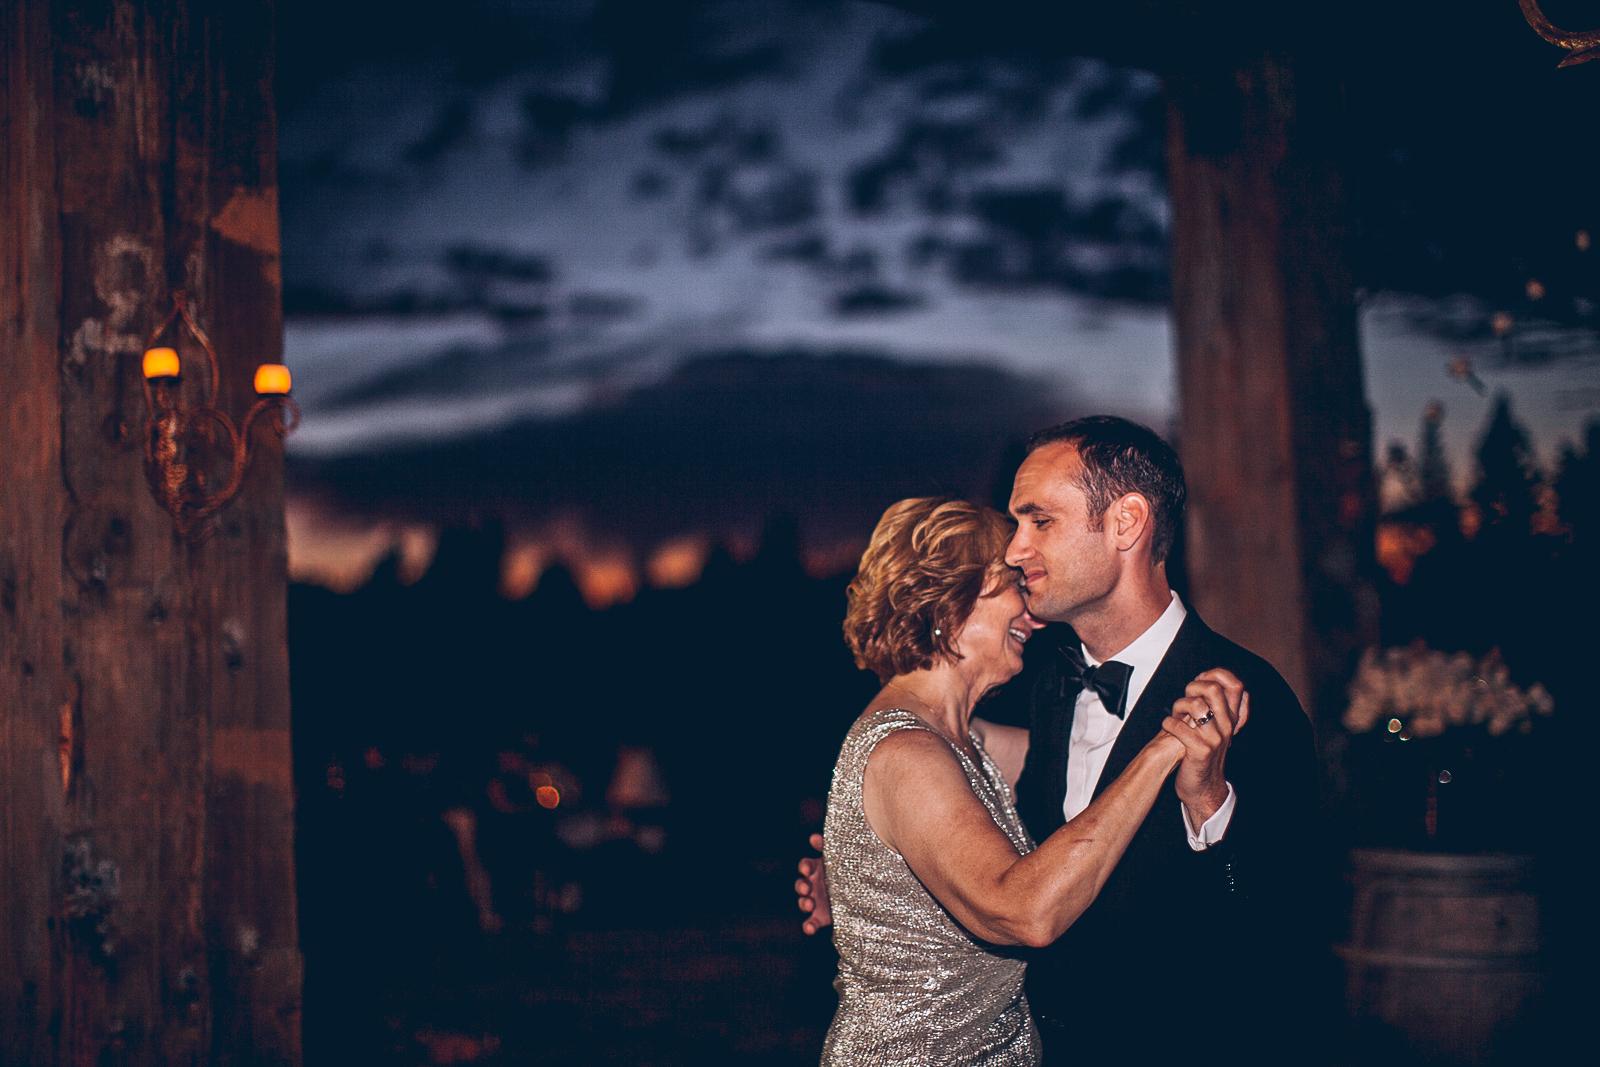 miraflores_winery_wedding_photography_ian_melissa_ebony_siovhan_bokeh_photography_75.jpg